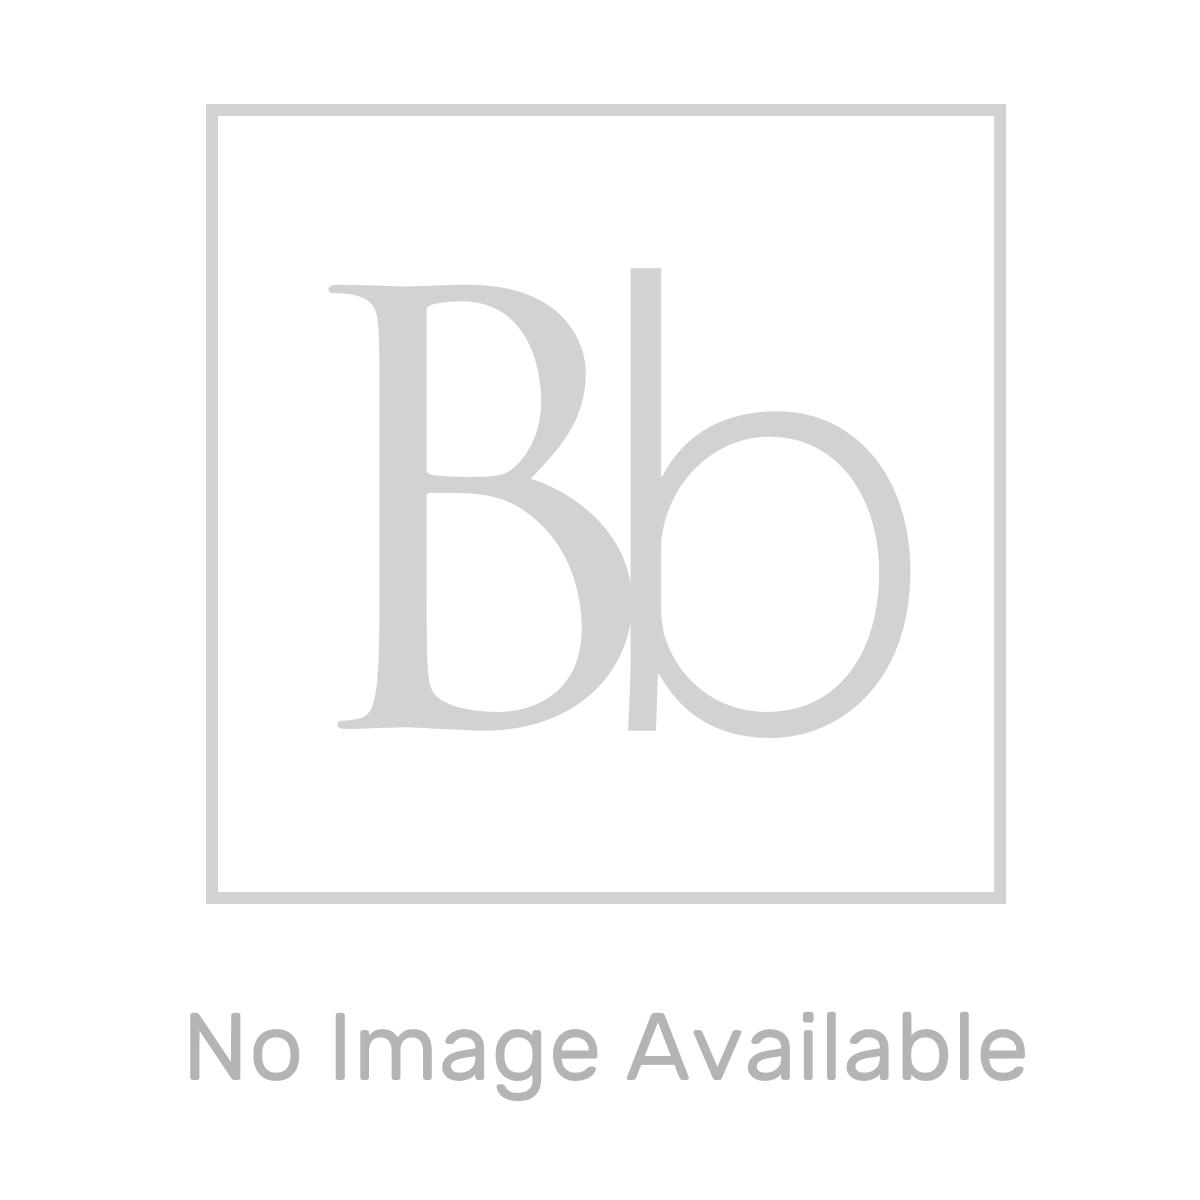 Richmond & Carlton Twilight Blue Soft Close Toilet Seat Dimensions